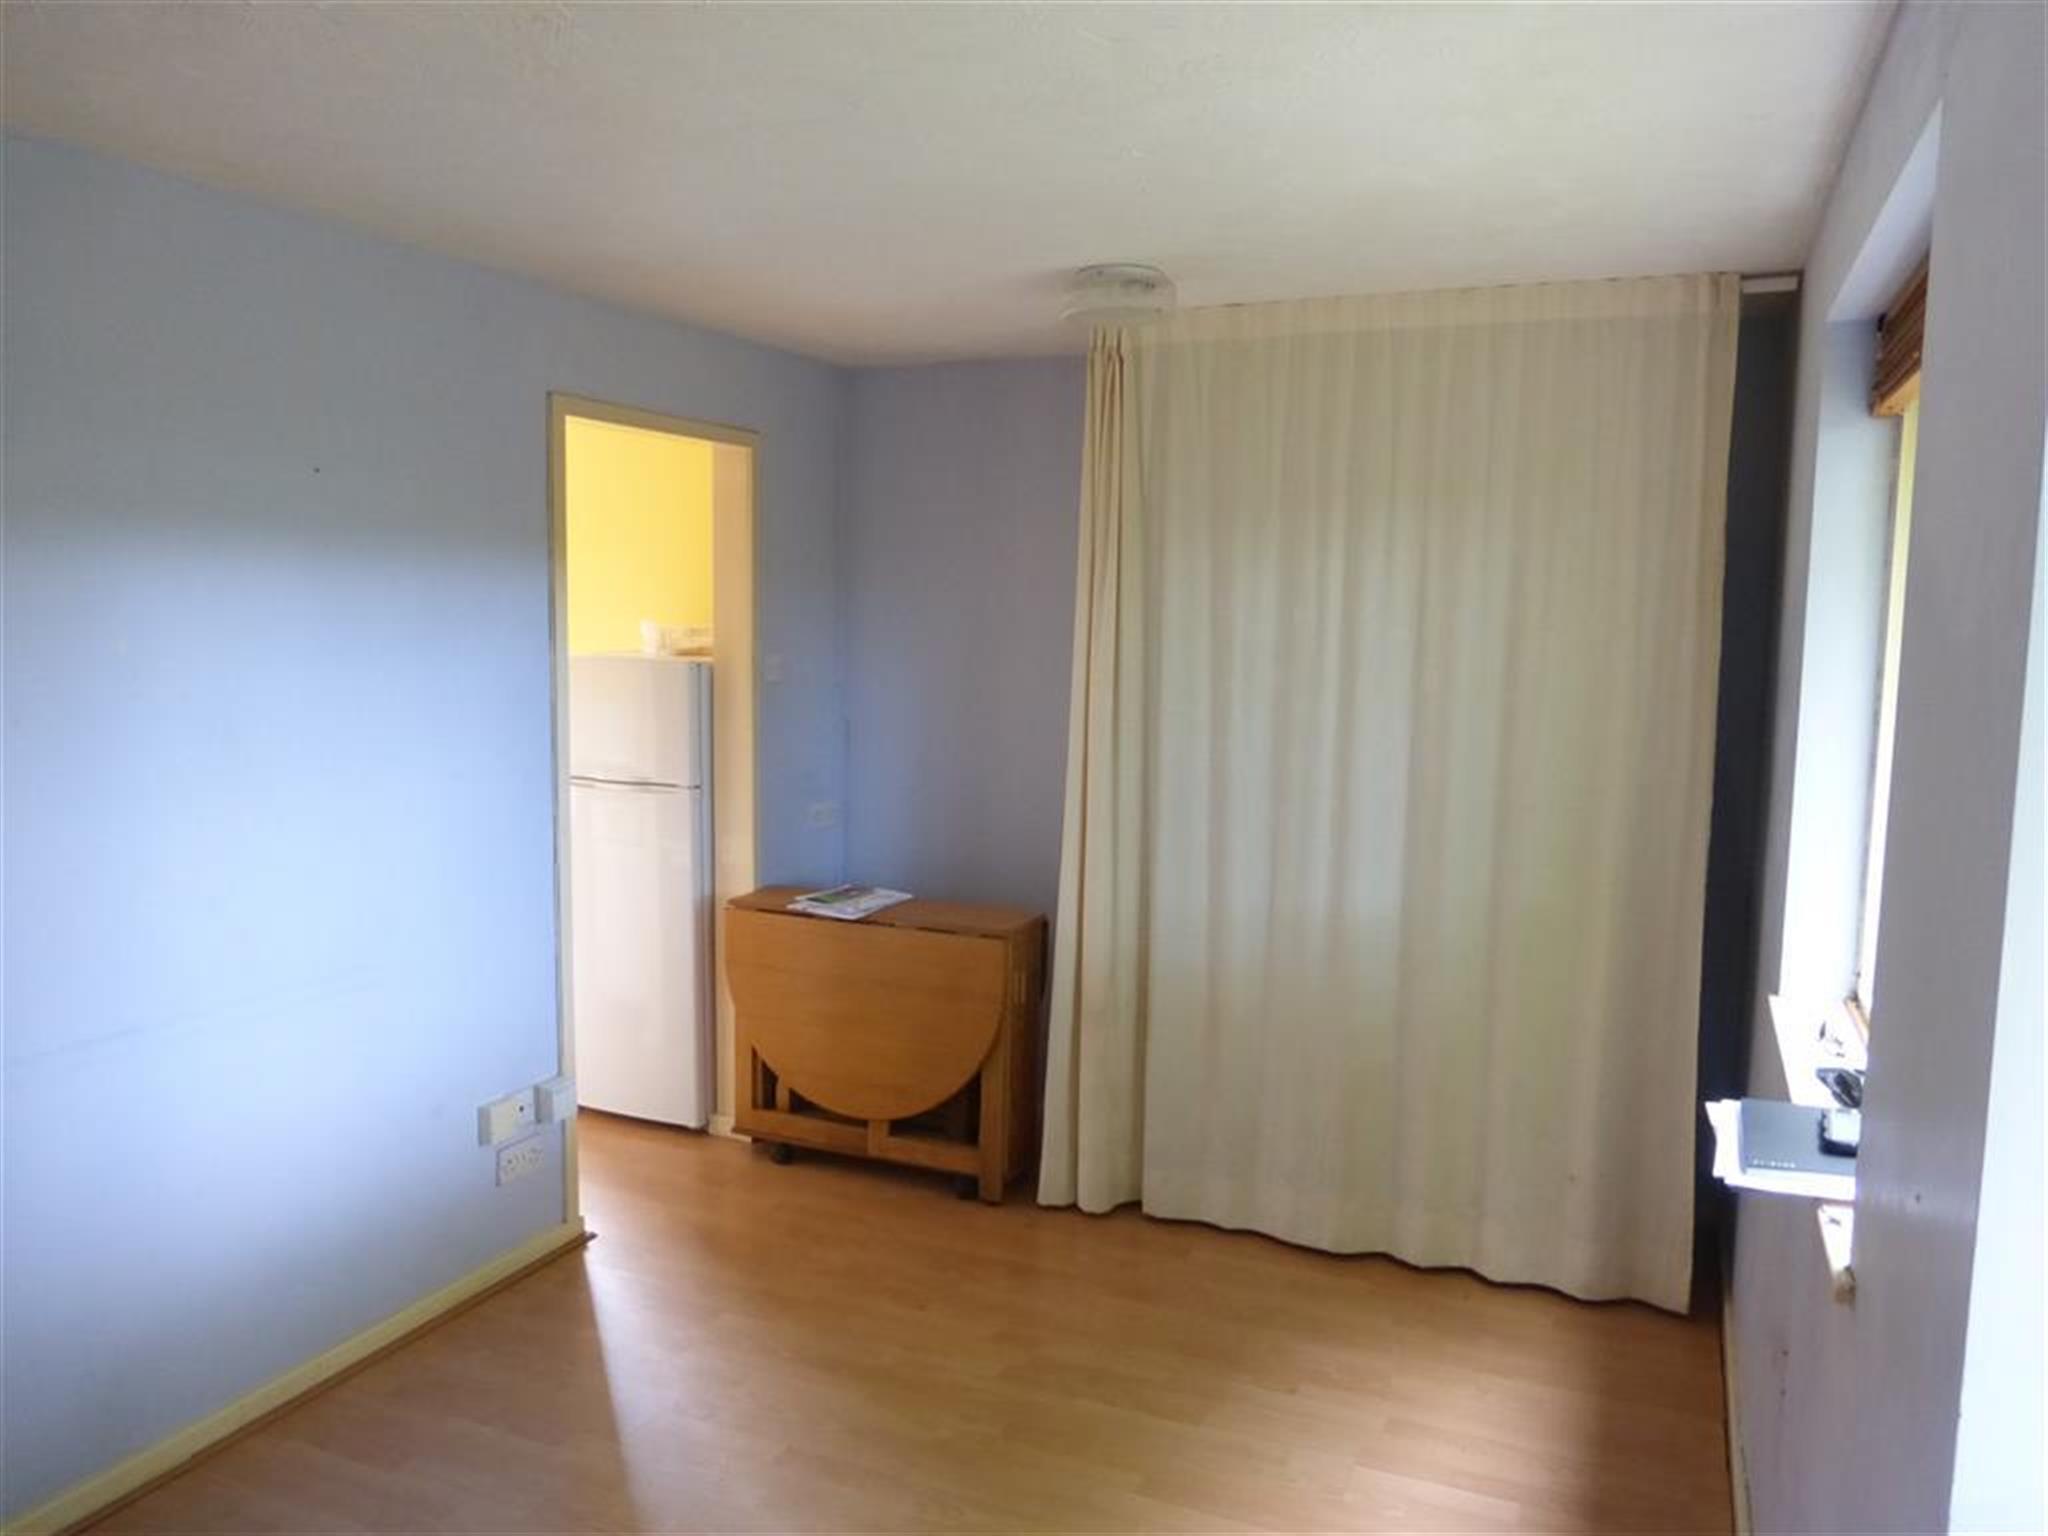 1 bedroom studio flat to rent martin rise sheffield s21. Black Bedroom Furniture Sets. Home Design Ideas